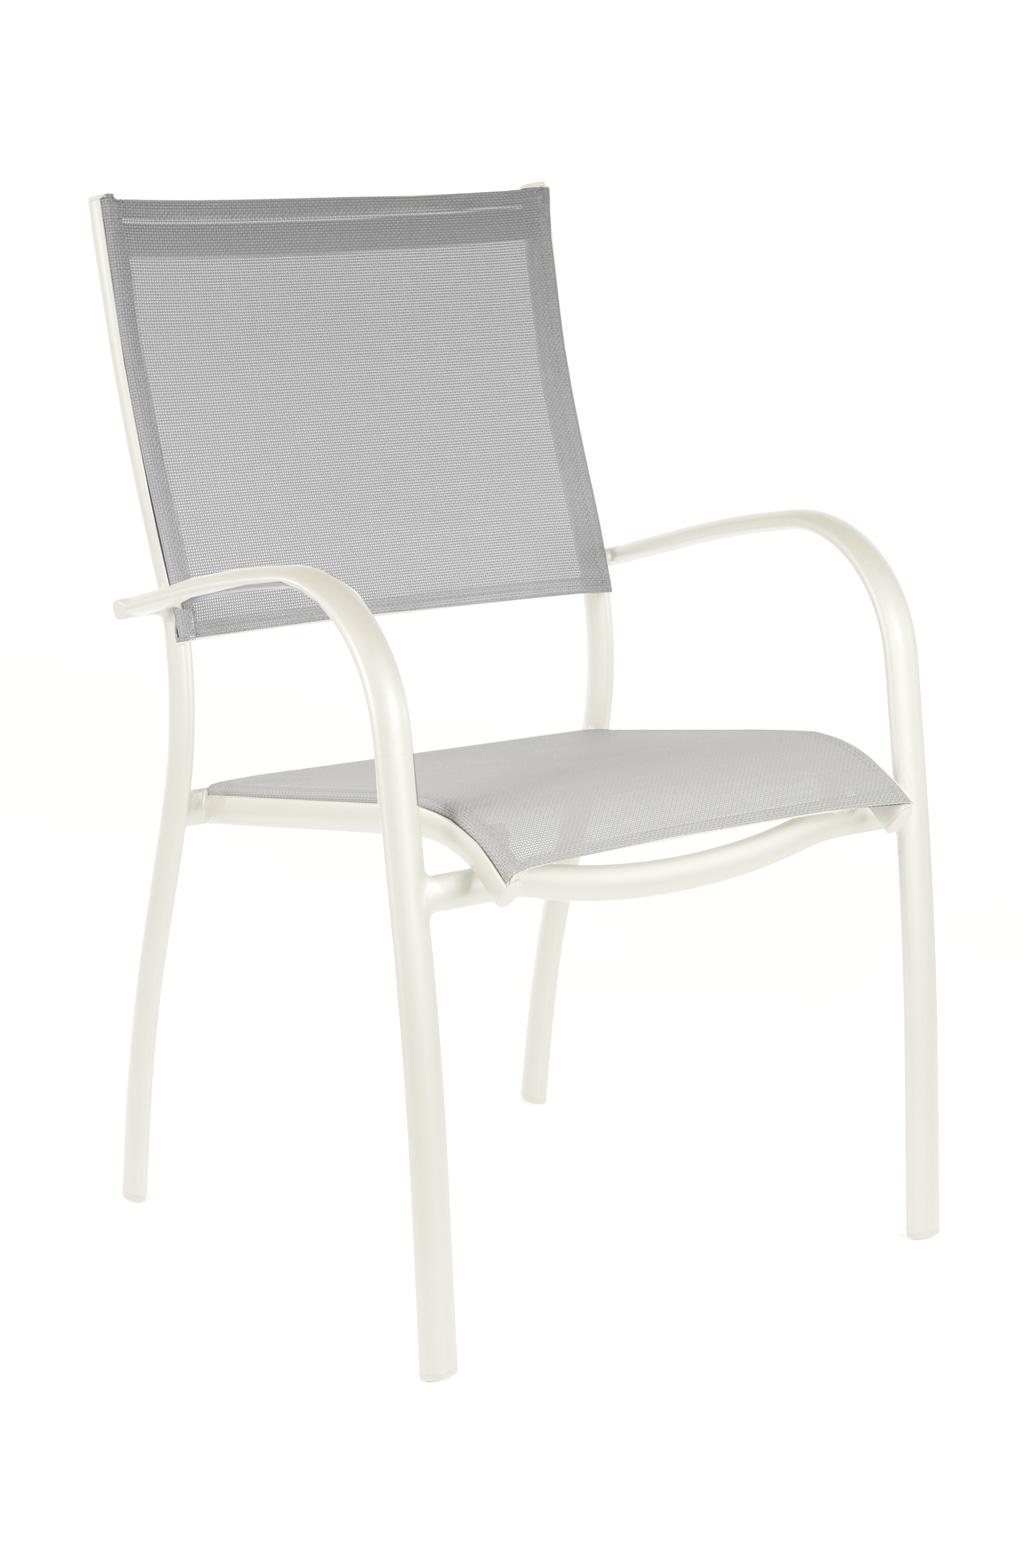 fauteuil elegance oceo monobloc blanc sun mobilier. Black Bedroom Furniture Sets. Home Design Ideas